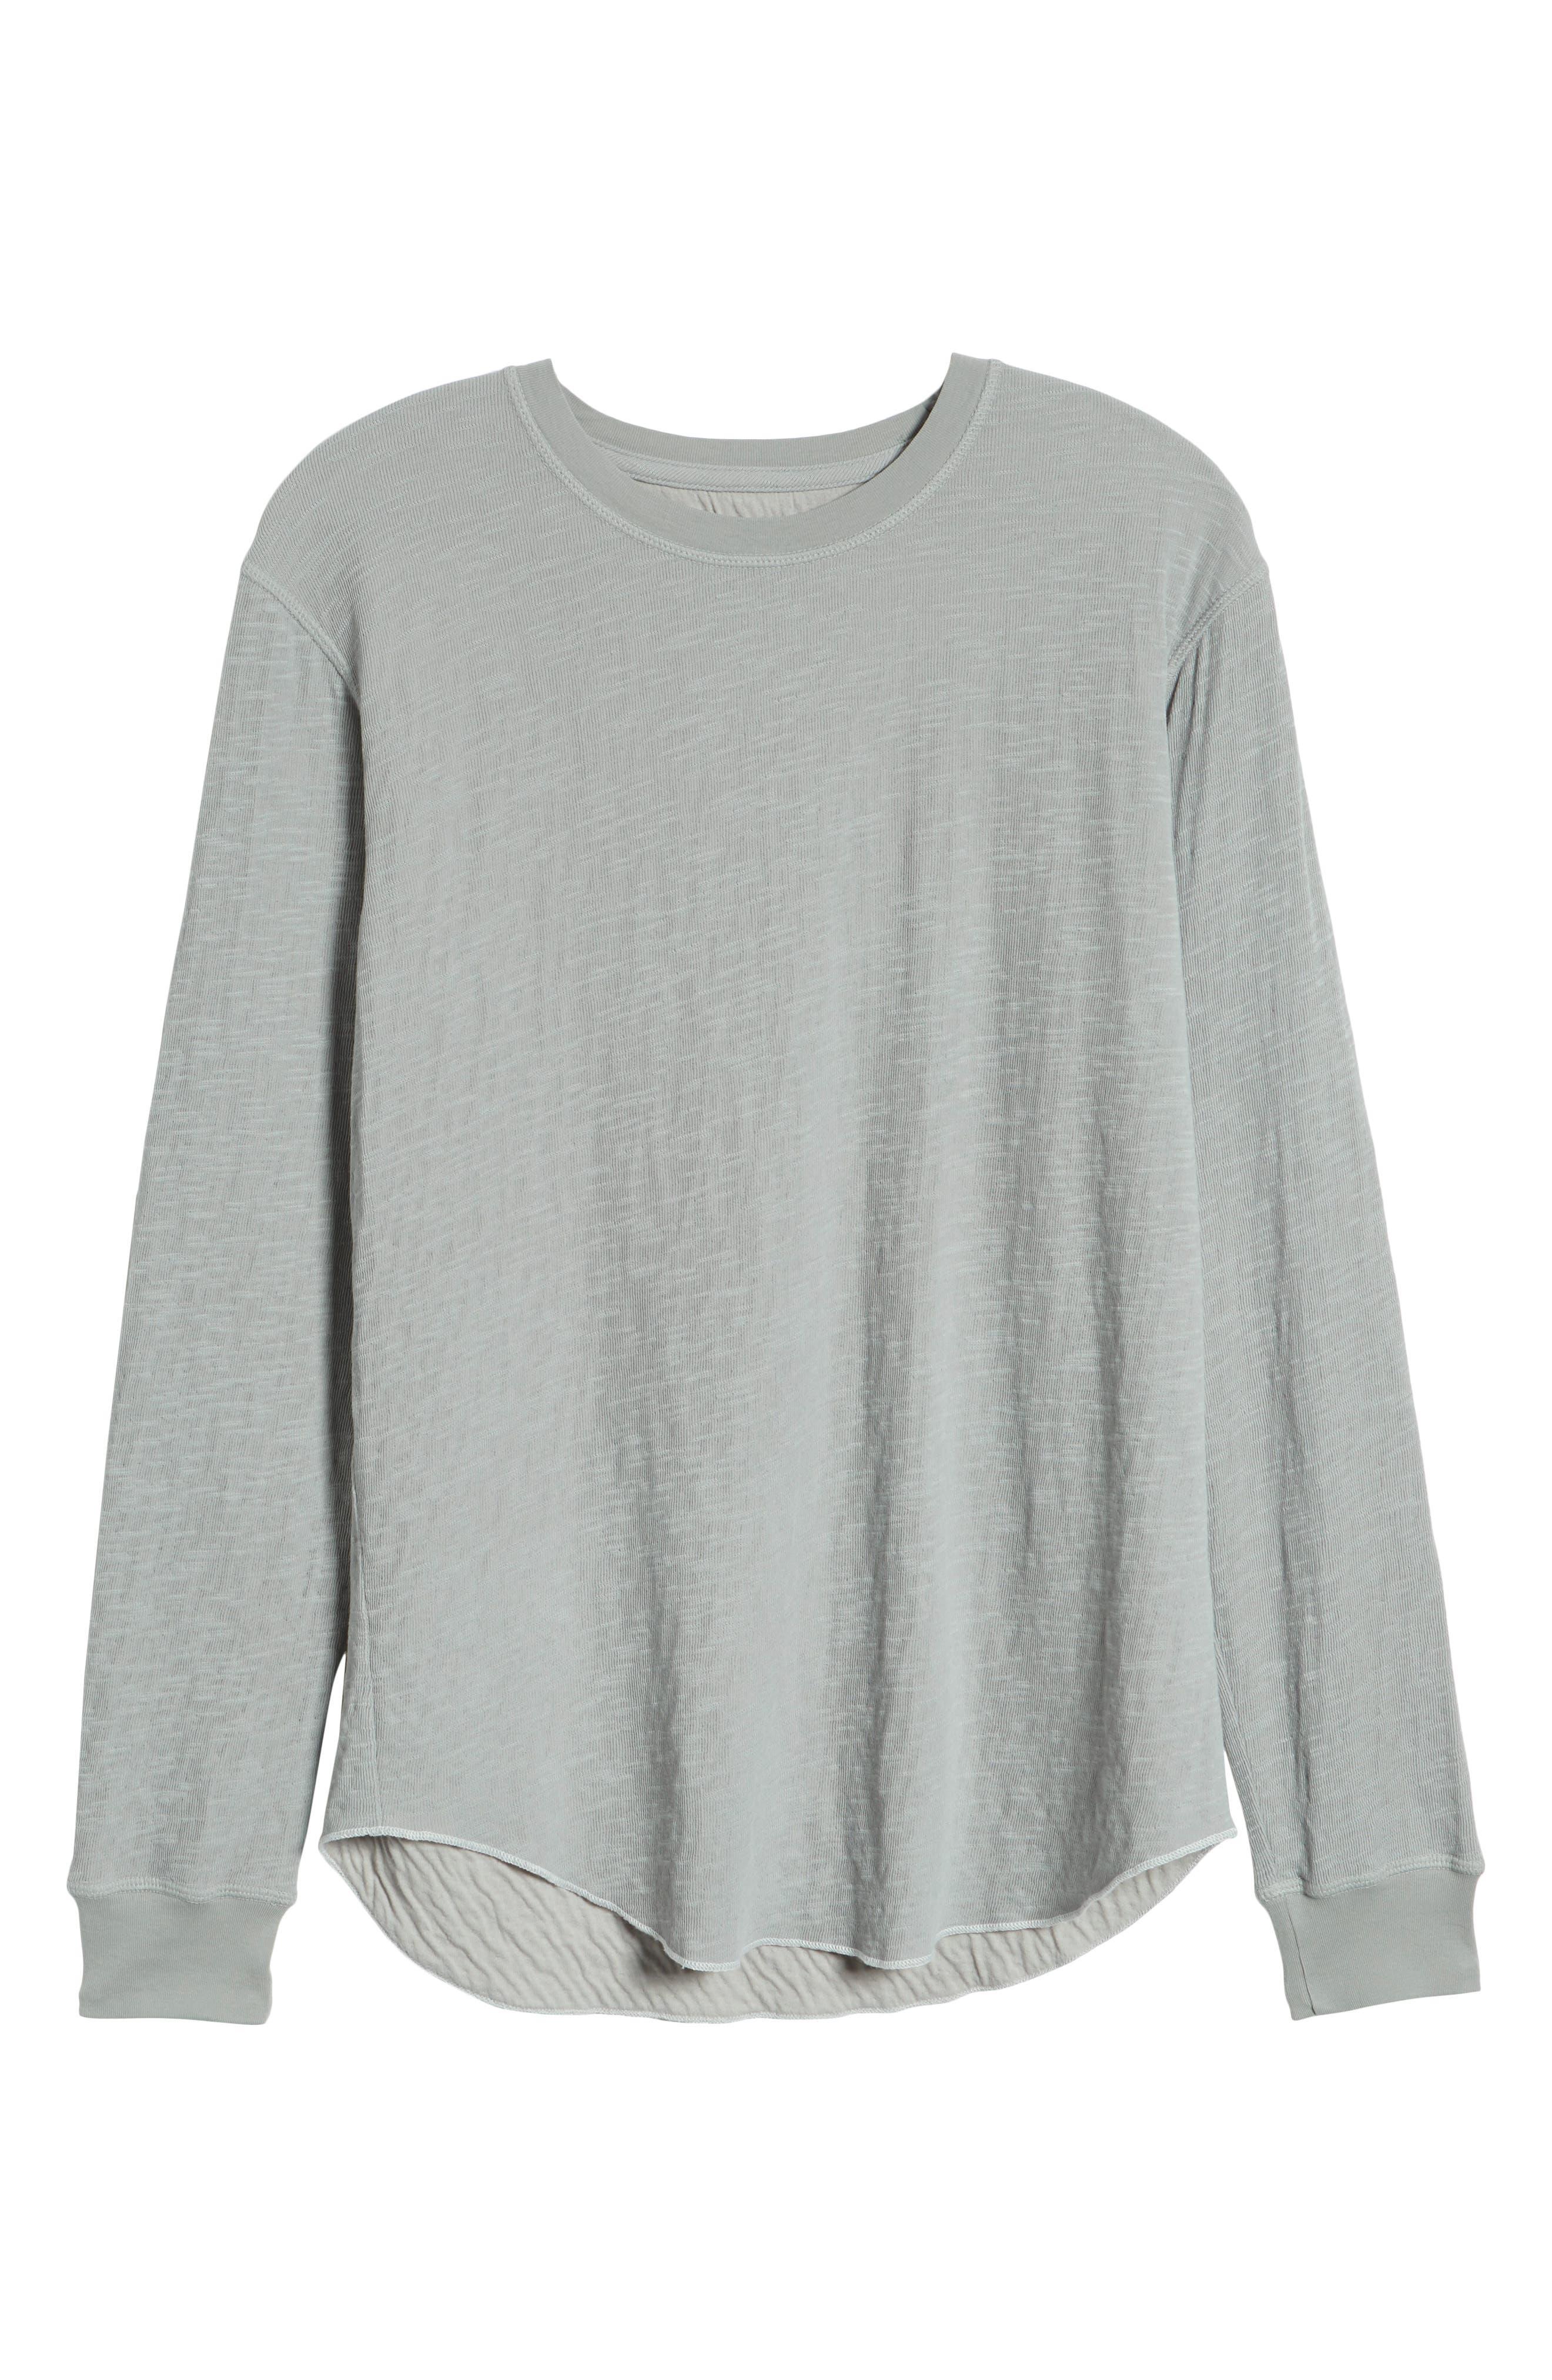 GOODLIFE, Double Layer Slim Crewneck T-Shirt, Alternate thumbnail 6, color, QUARRY